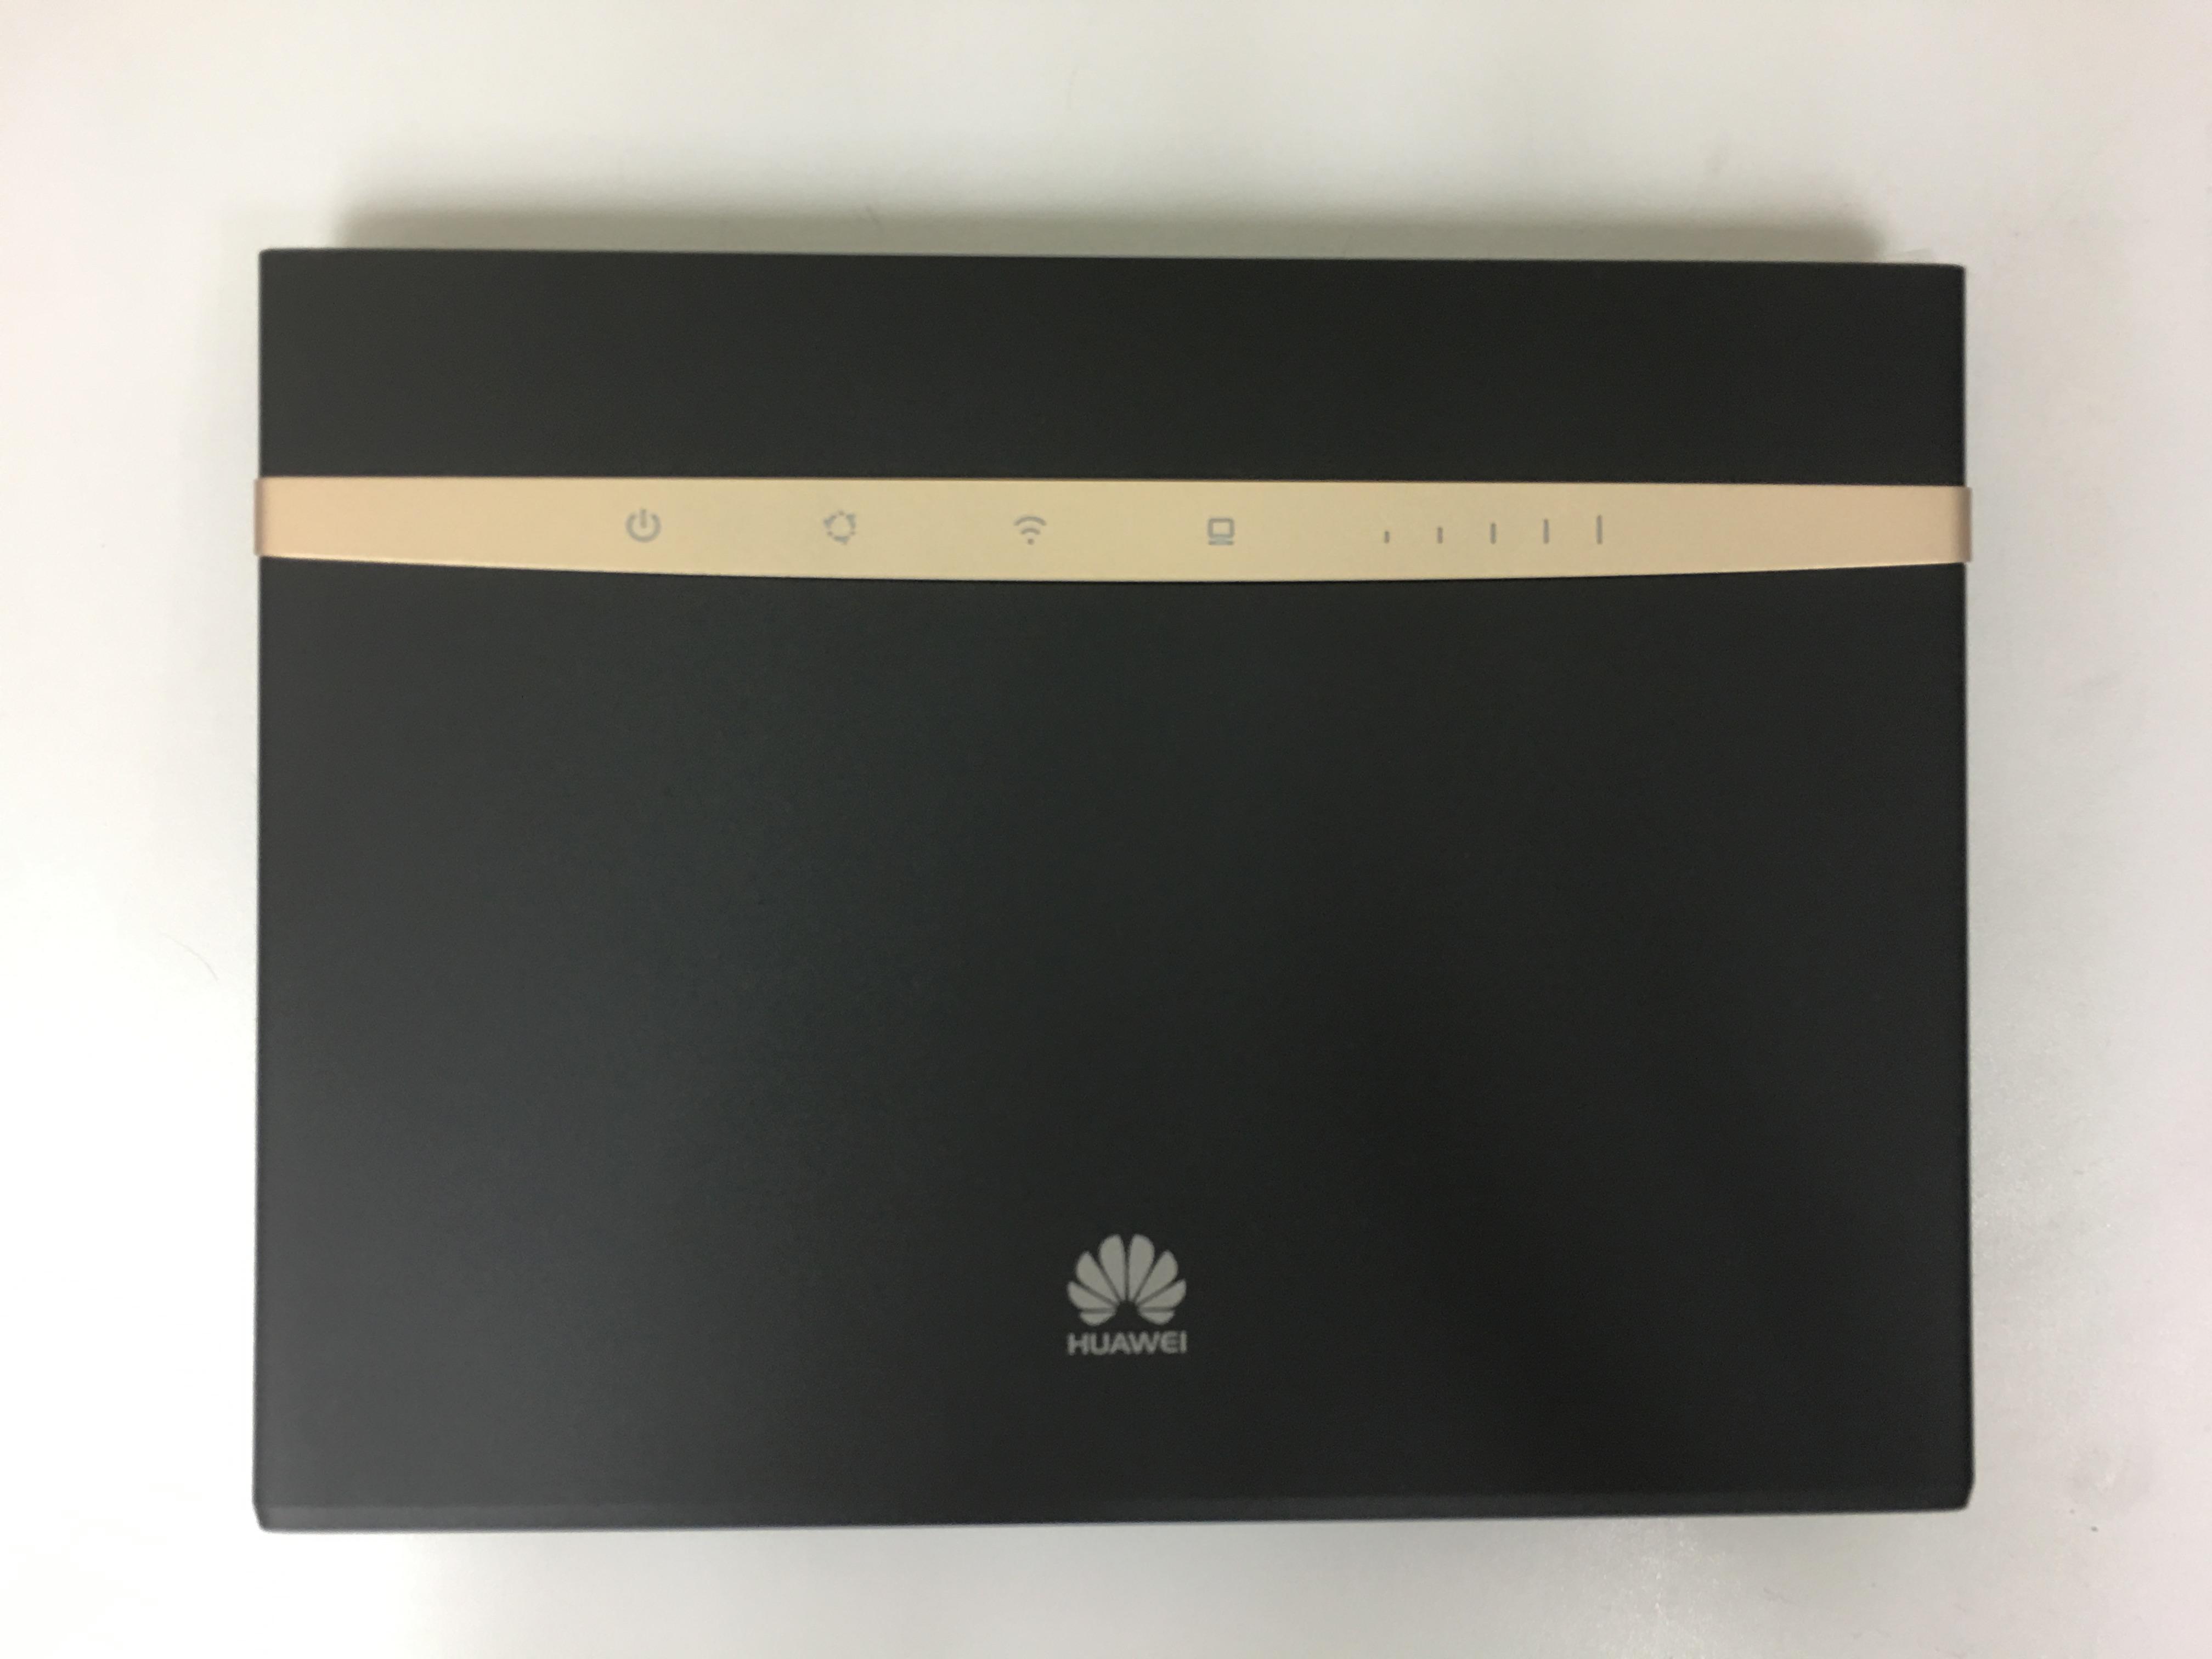 Huawei 社特約店で B525s-65a 2 アンテナ LTE Cat6 CA CPE ワイヤレス Wi-Fi ルータ 4 グラム Sim カードスロット 2.4 グラム/5 グラム B525